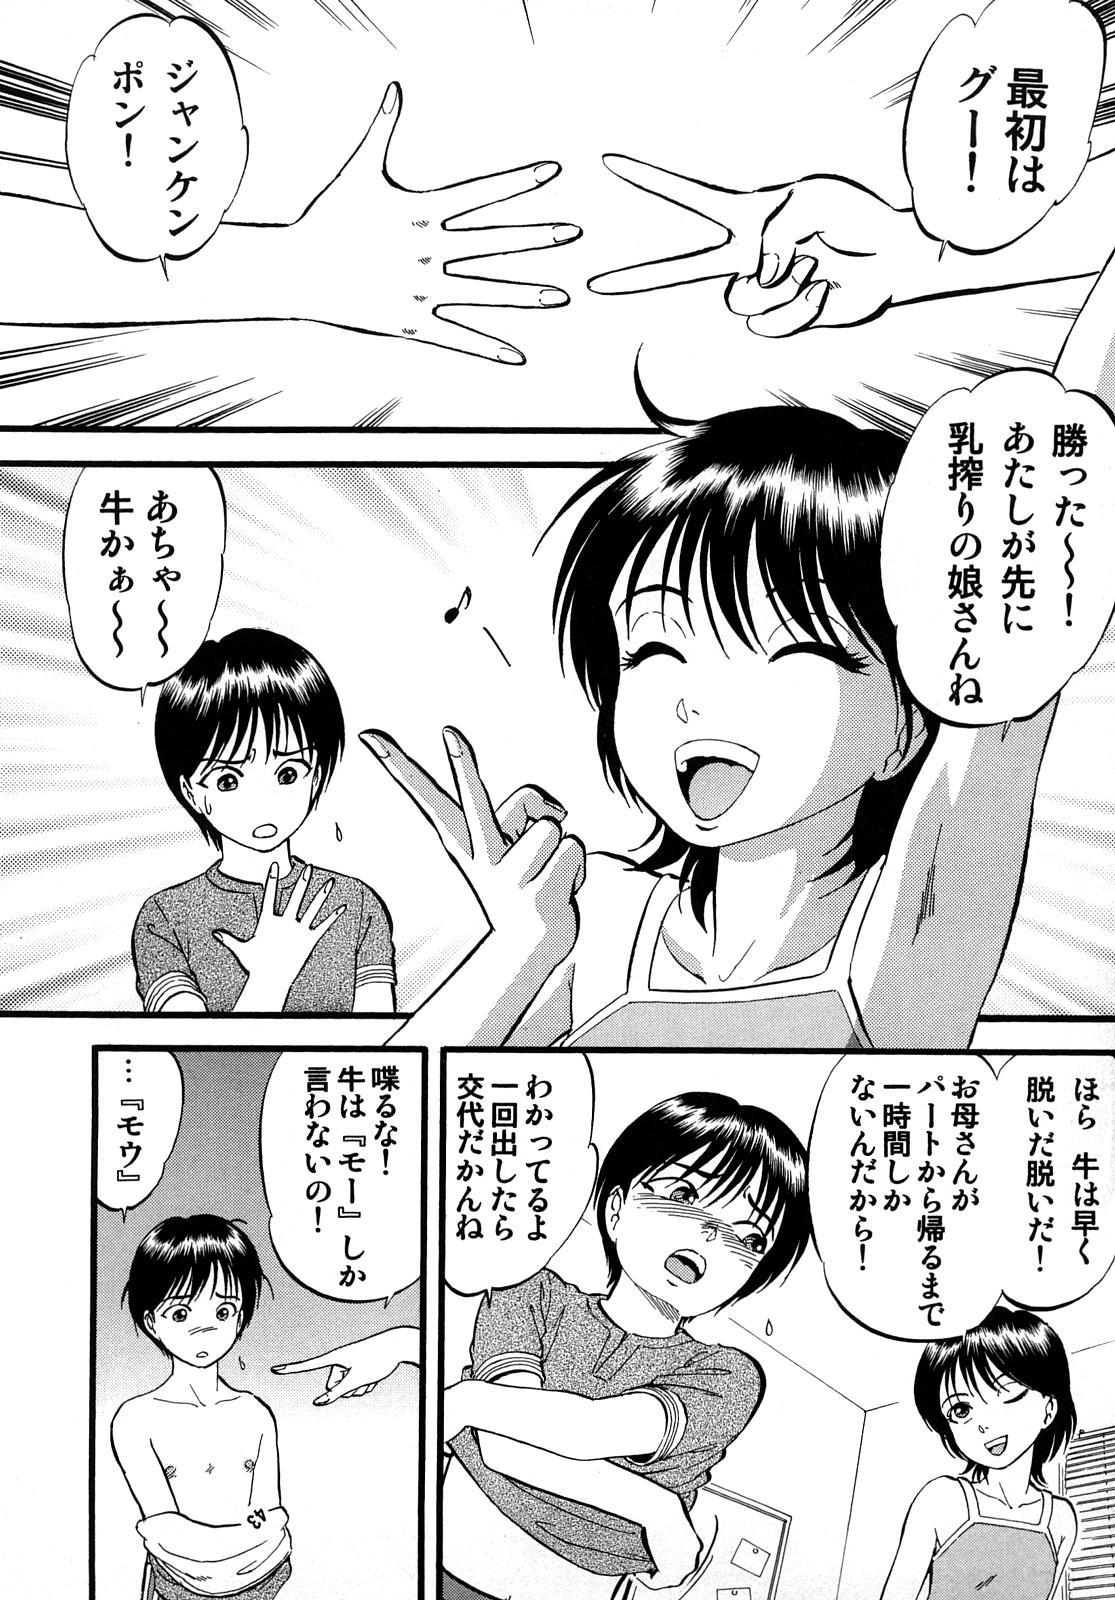 R Shitei Jou 24